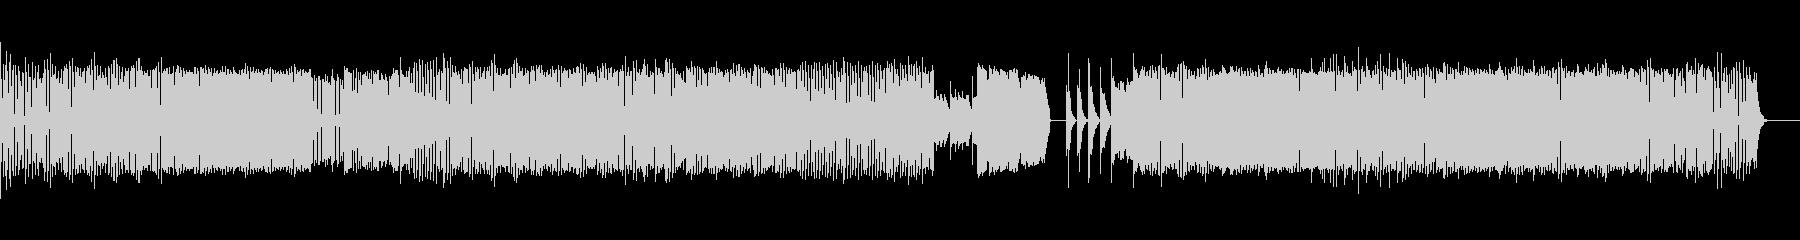 EDM最高♫ パート2の未再生の波形